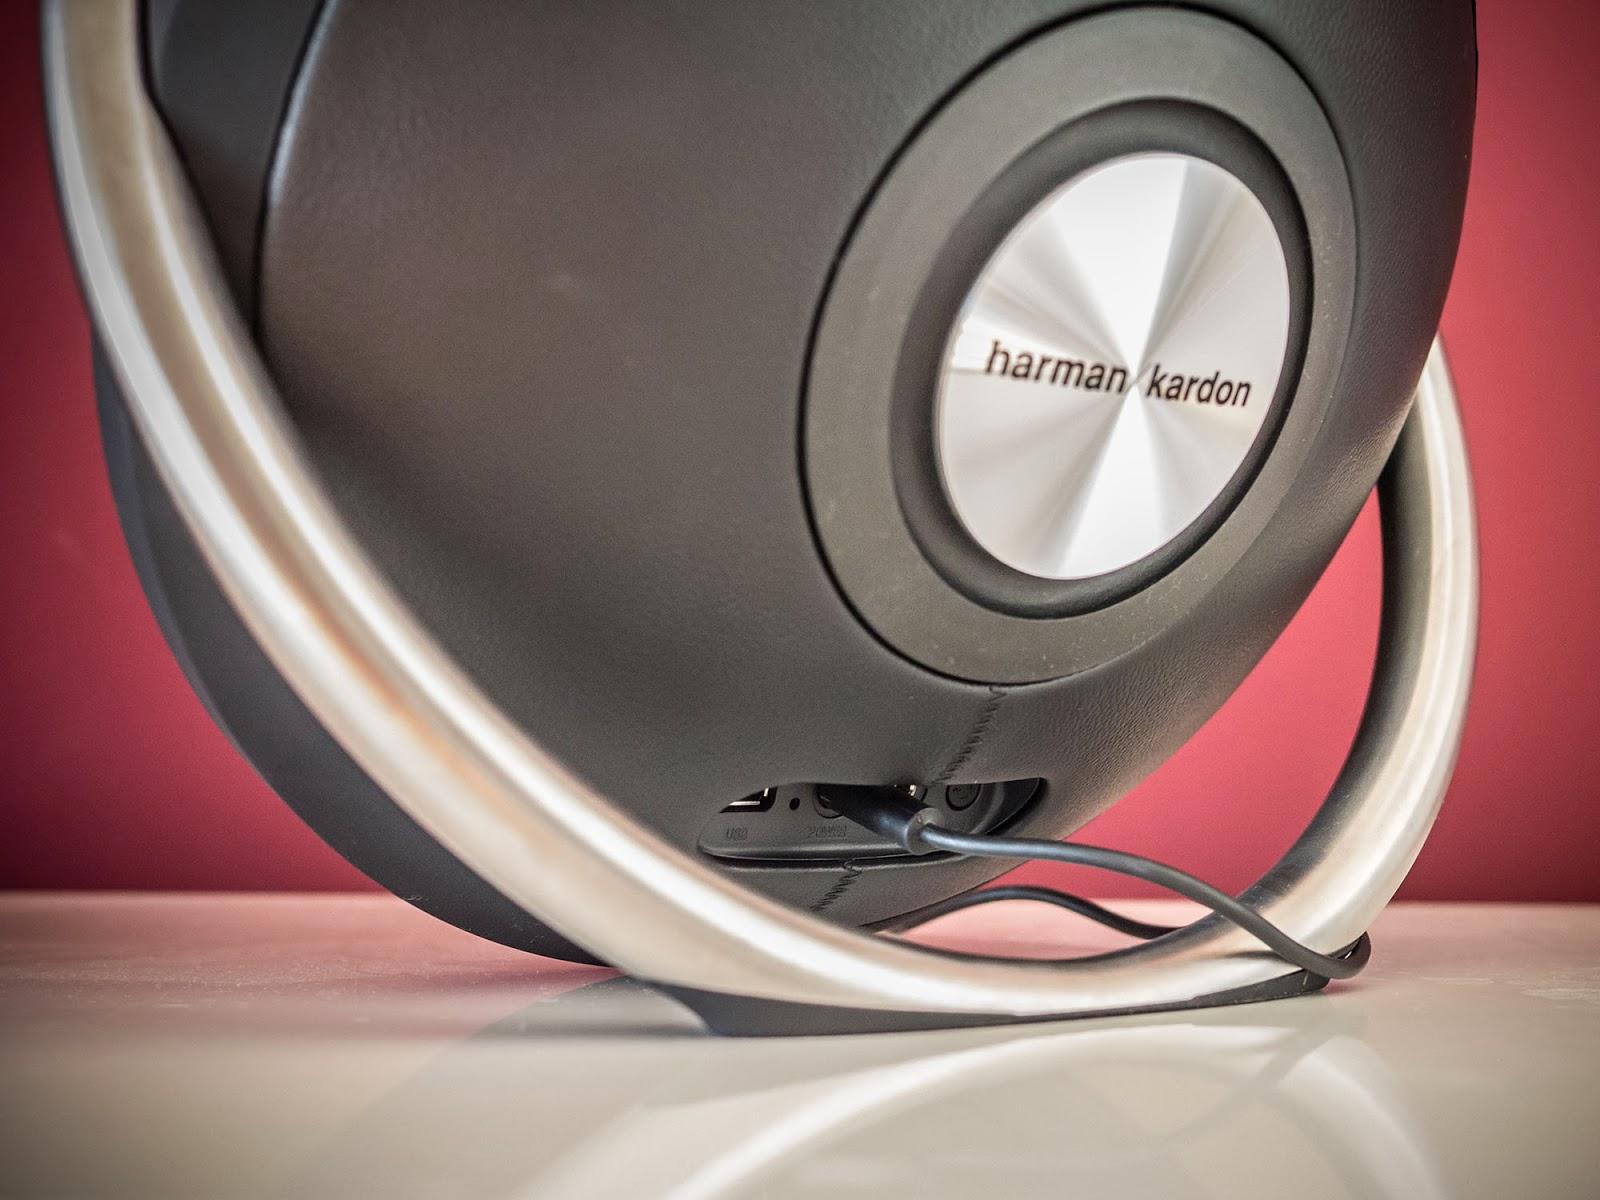 Oluv's Gadgets: Review: Harman Kardon Onyx - the ultimate